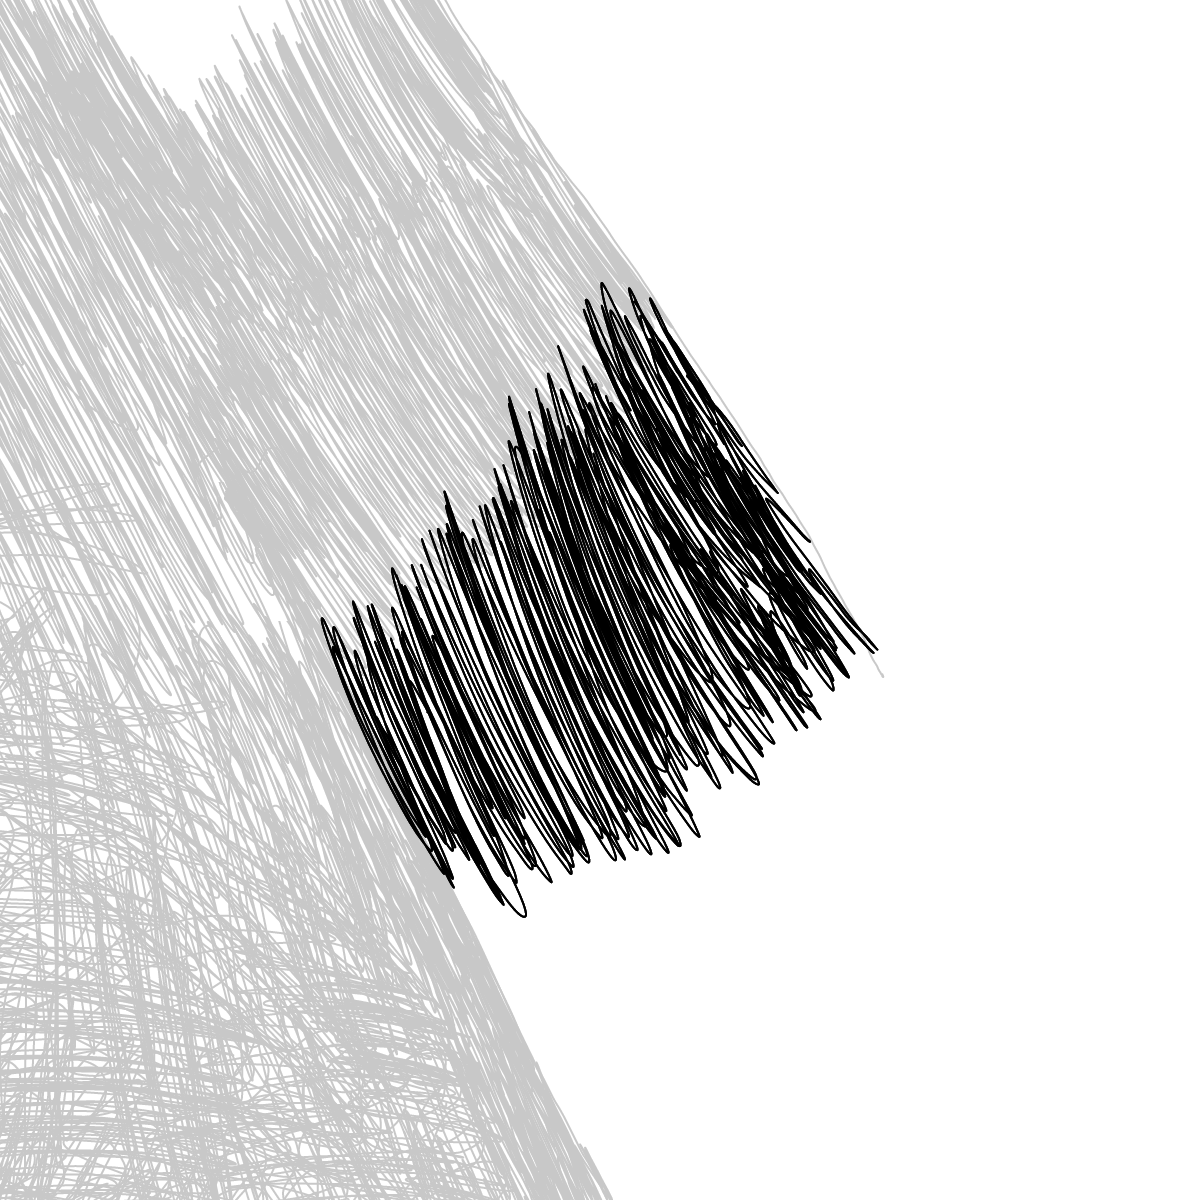 BAAAM drawing#8498 lat:52.4879837036132800lng: 13.4253749847412110